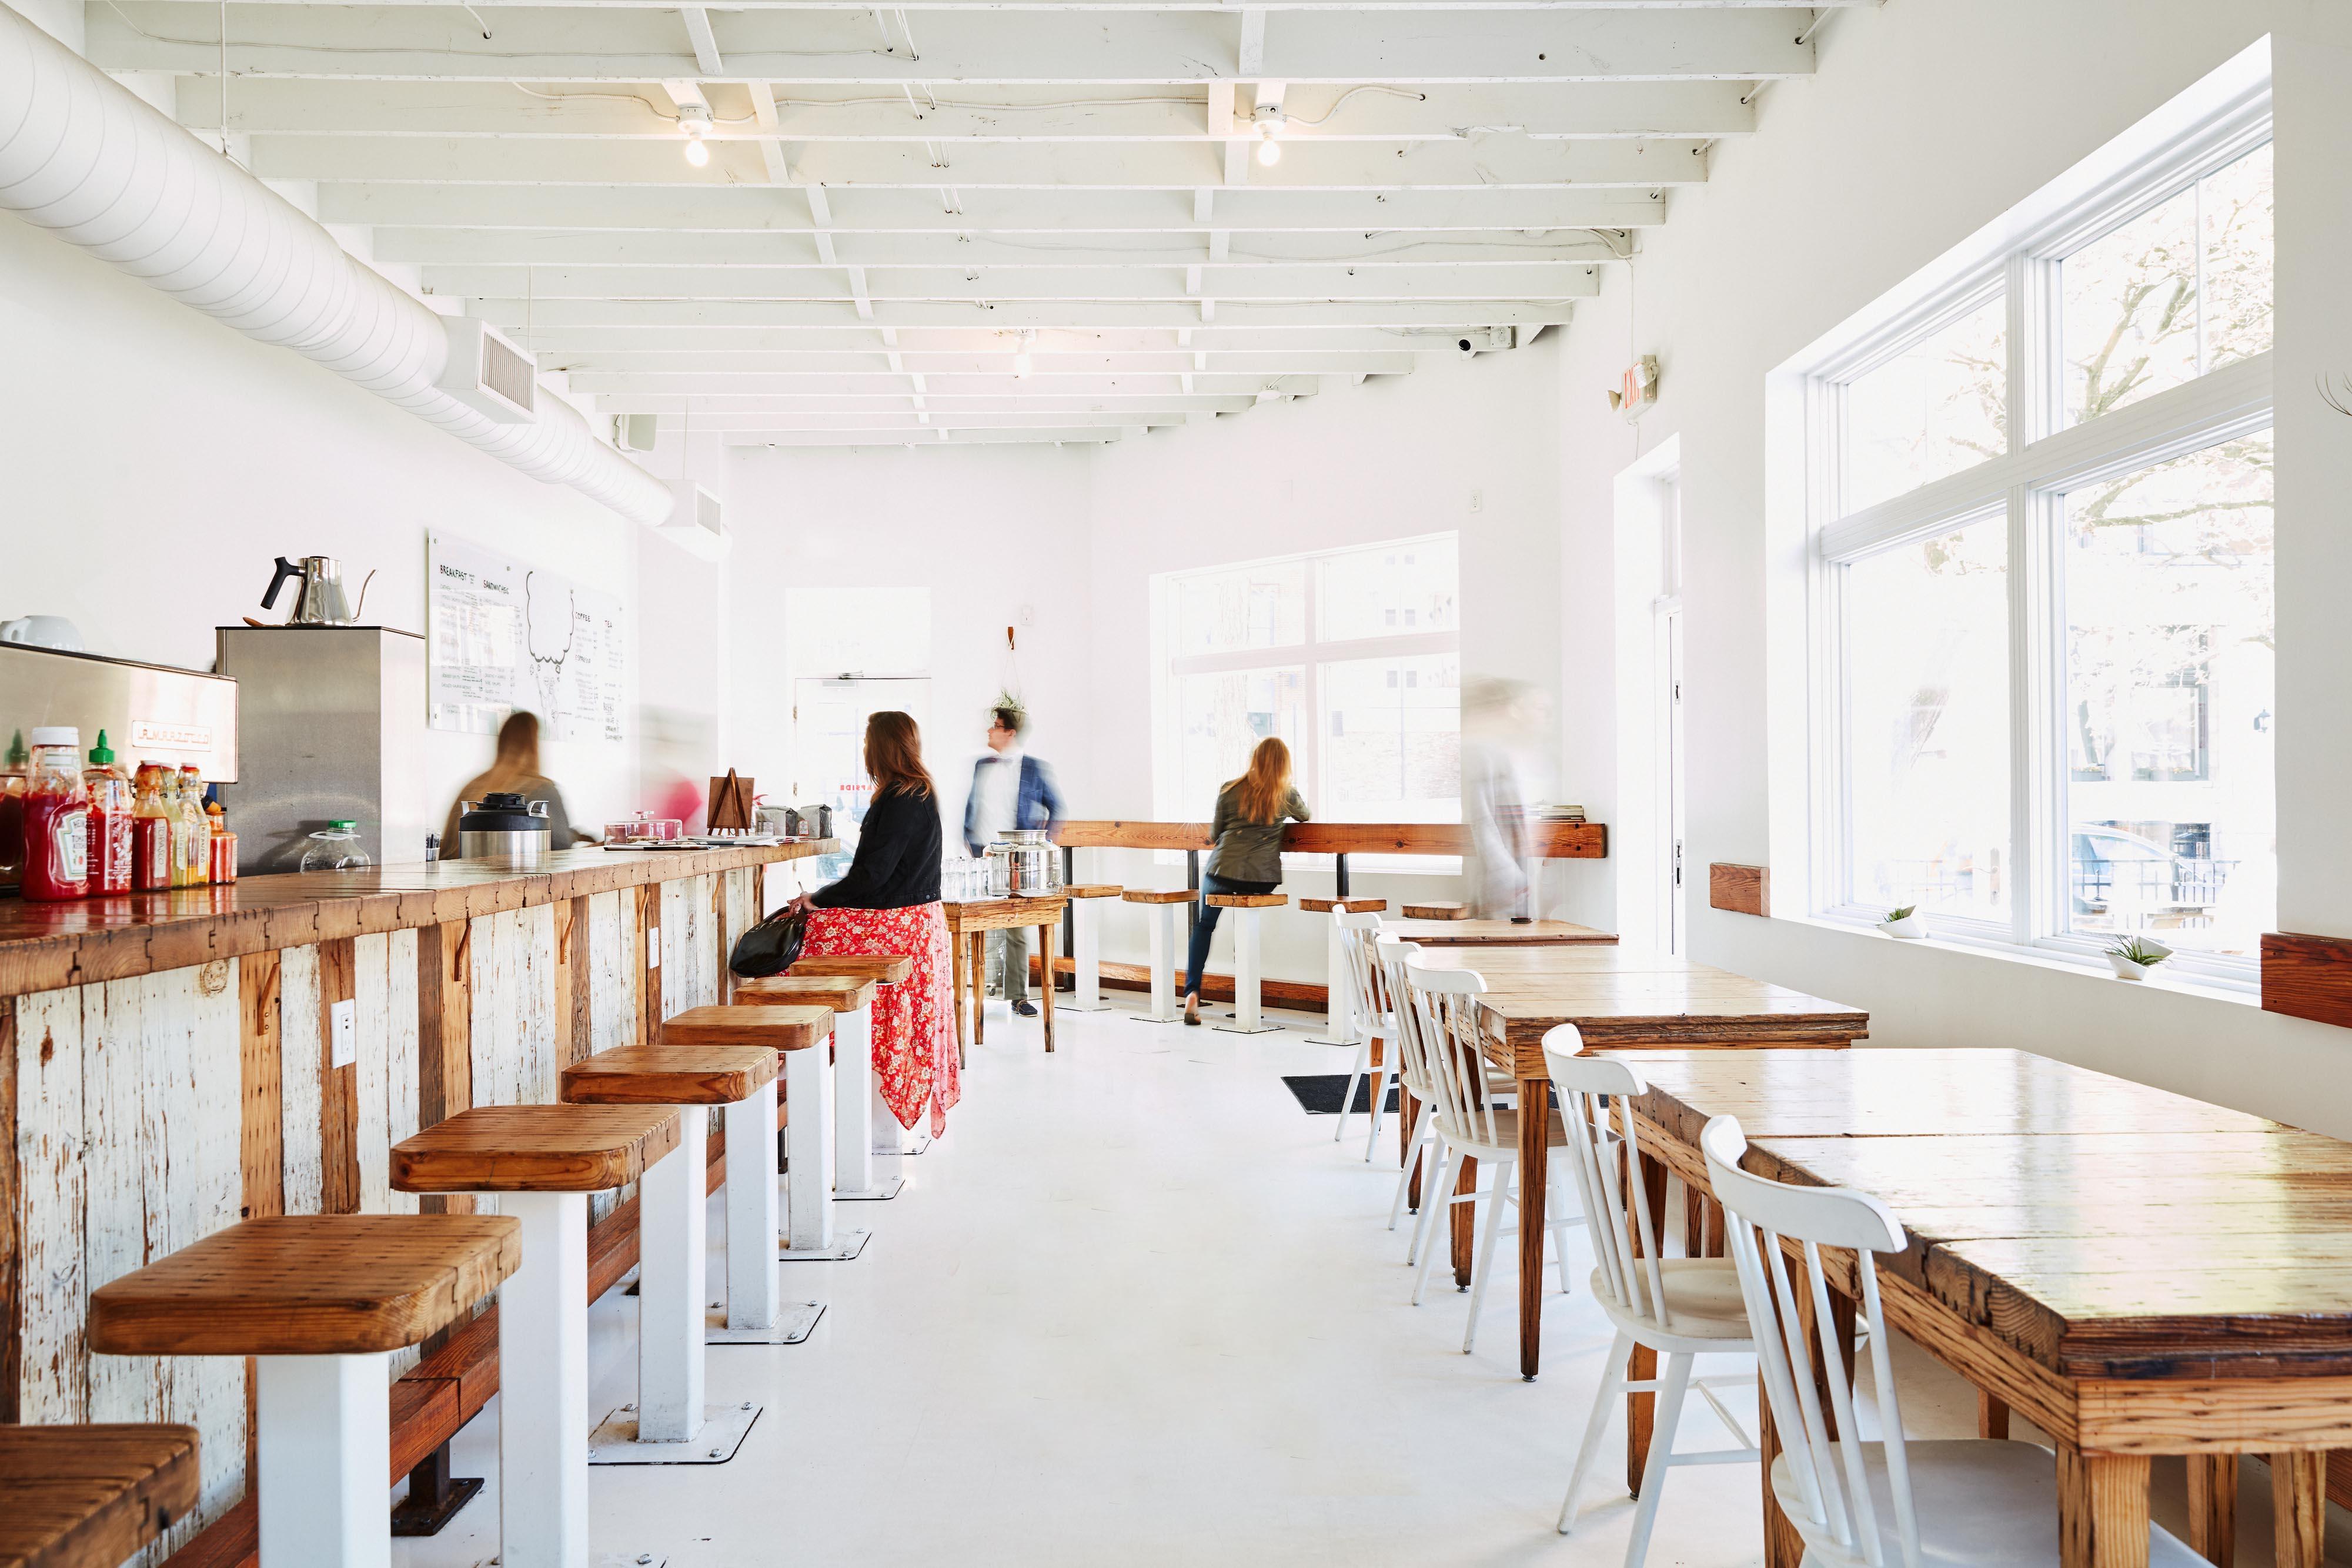 cheapside cafe people magazine